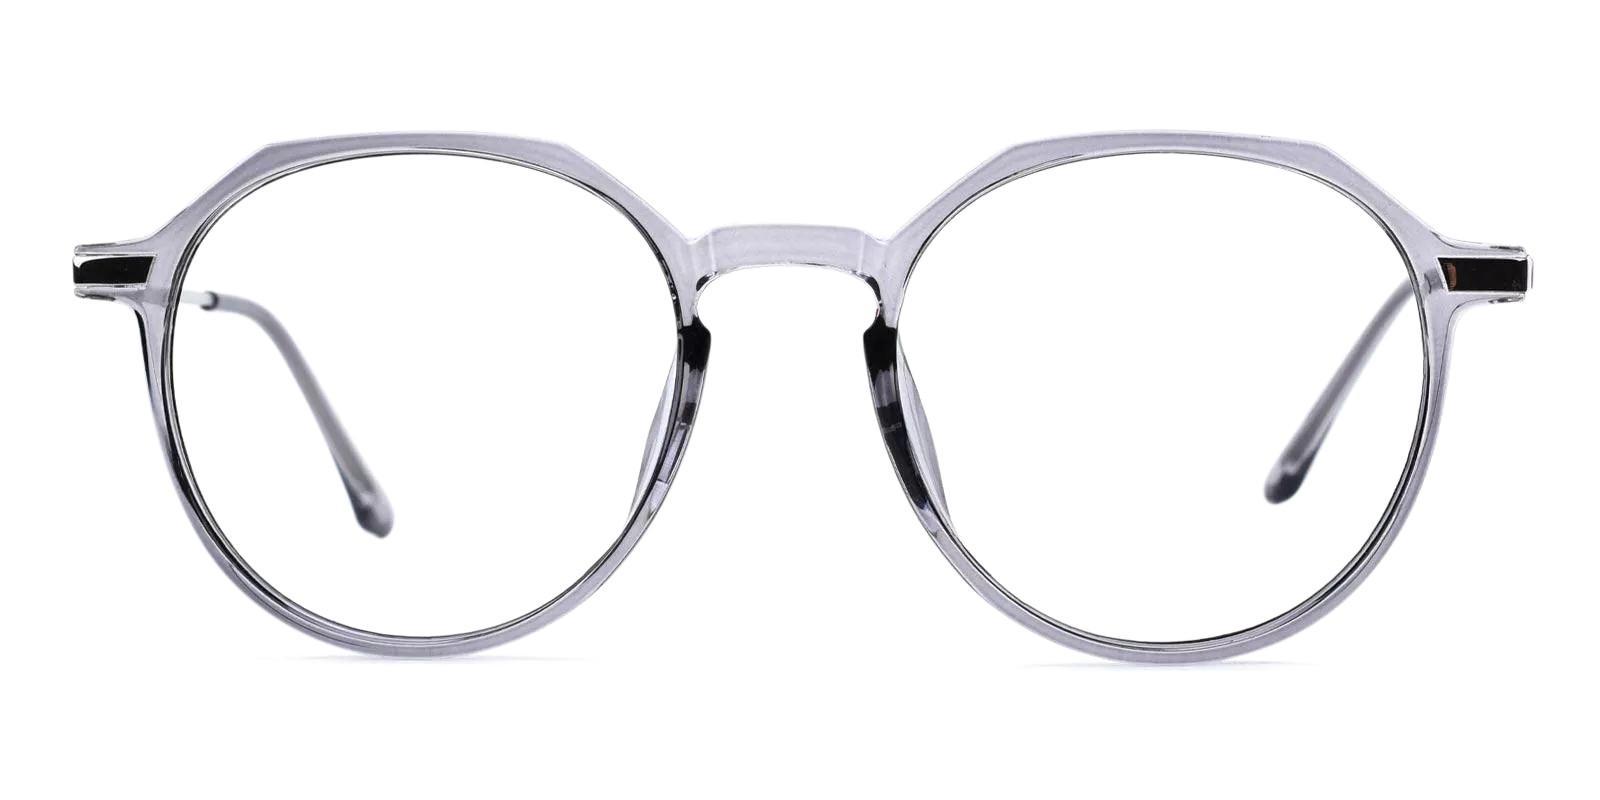 Hobbit Gray Combination Eyeglasses , Fashion , UniversalBridgeFit Frames from ABBE Glasses